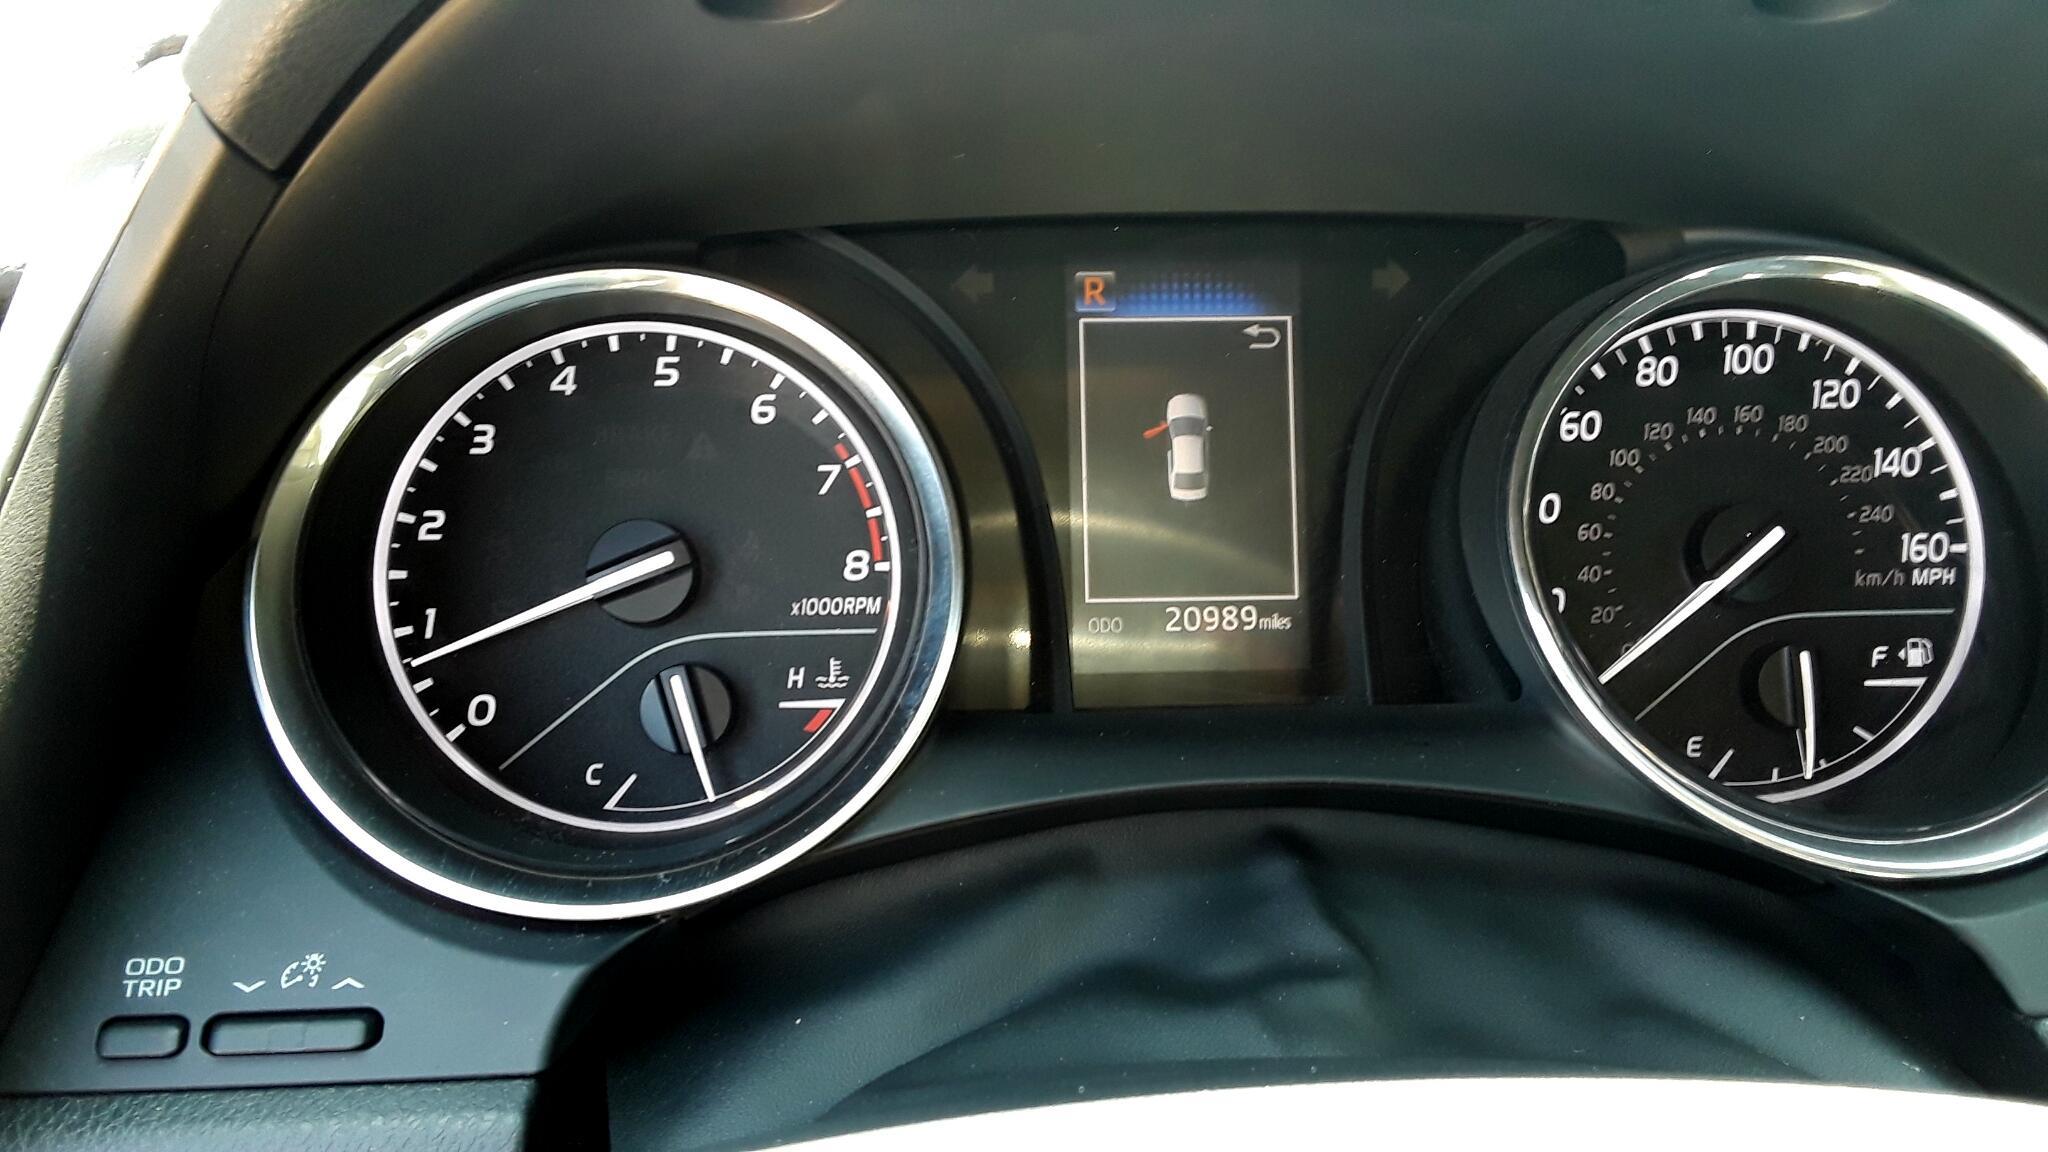 2019 Toyota Camry 4dr Sdn I4 Auto SE (Natl)